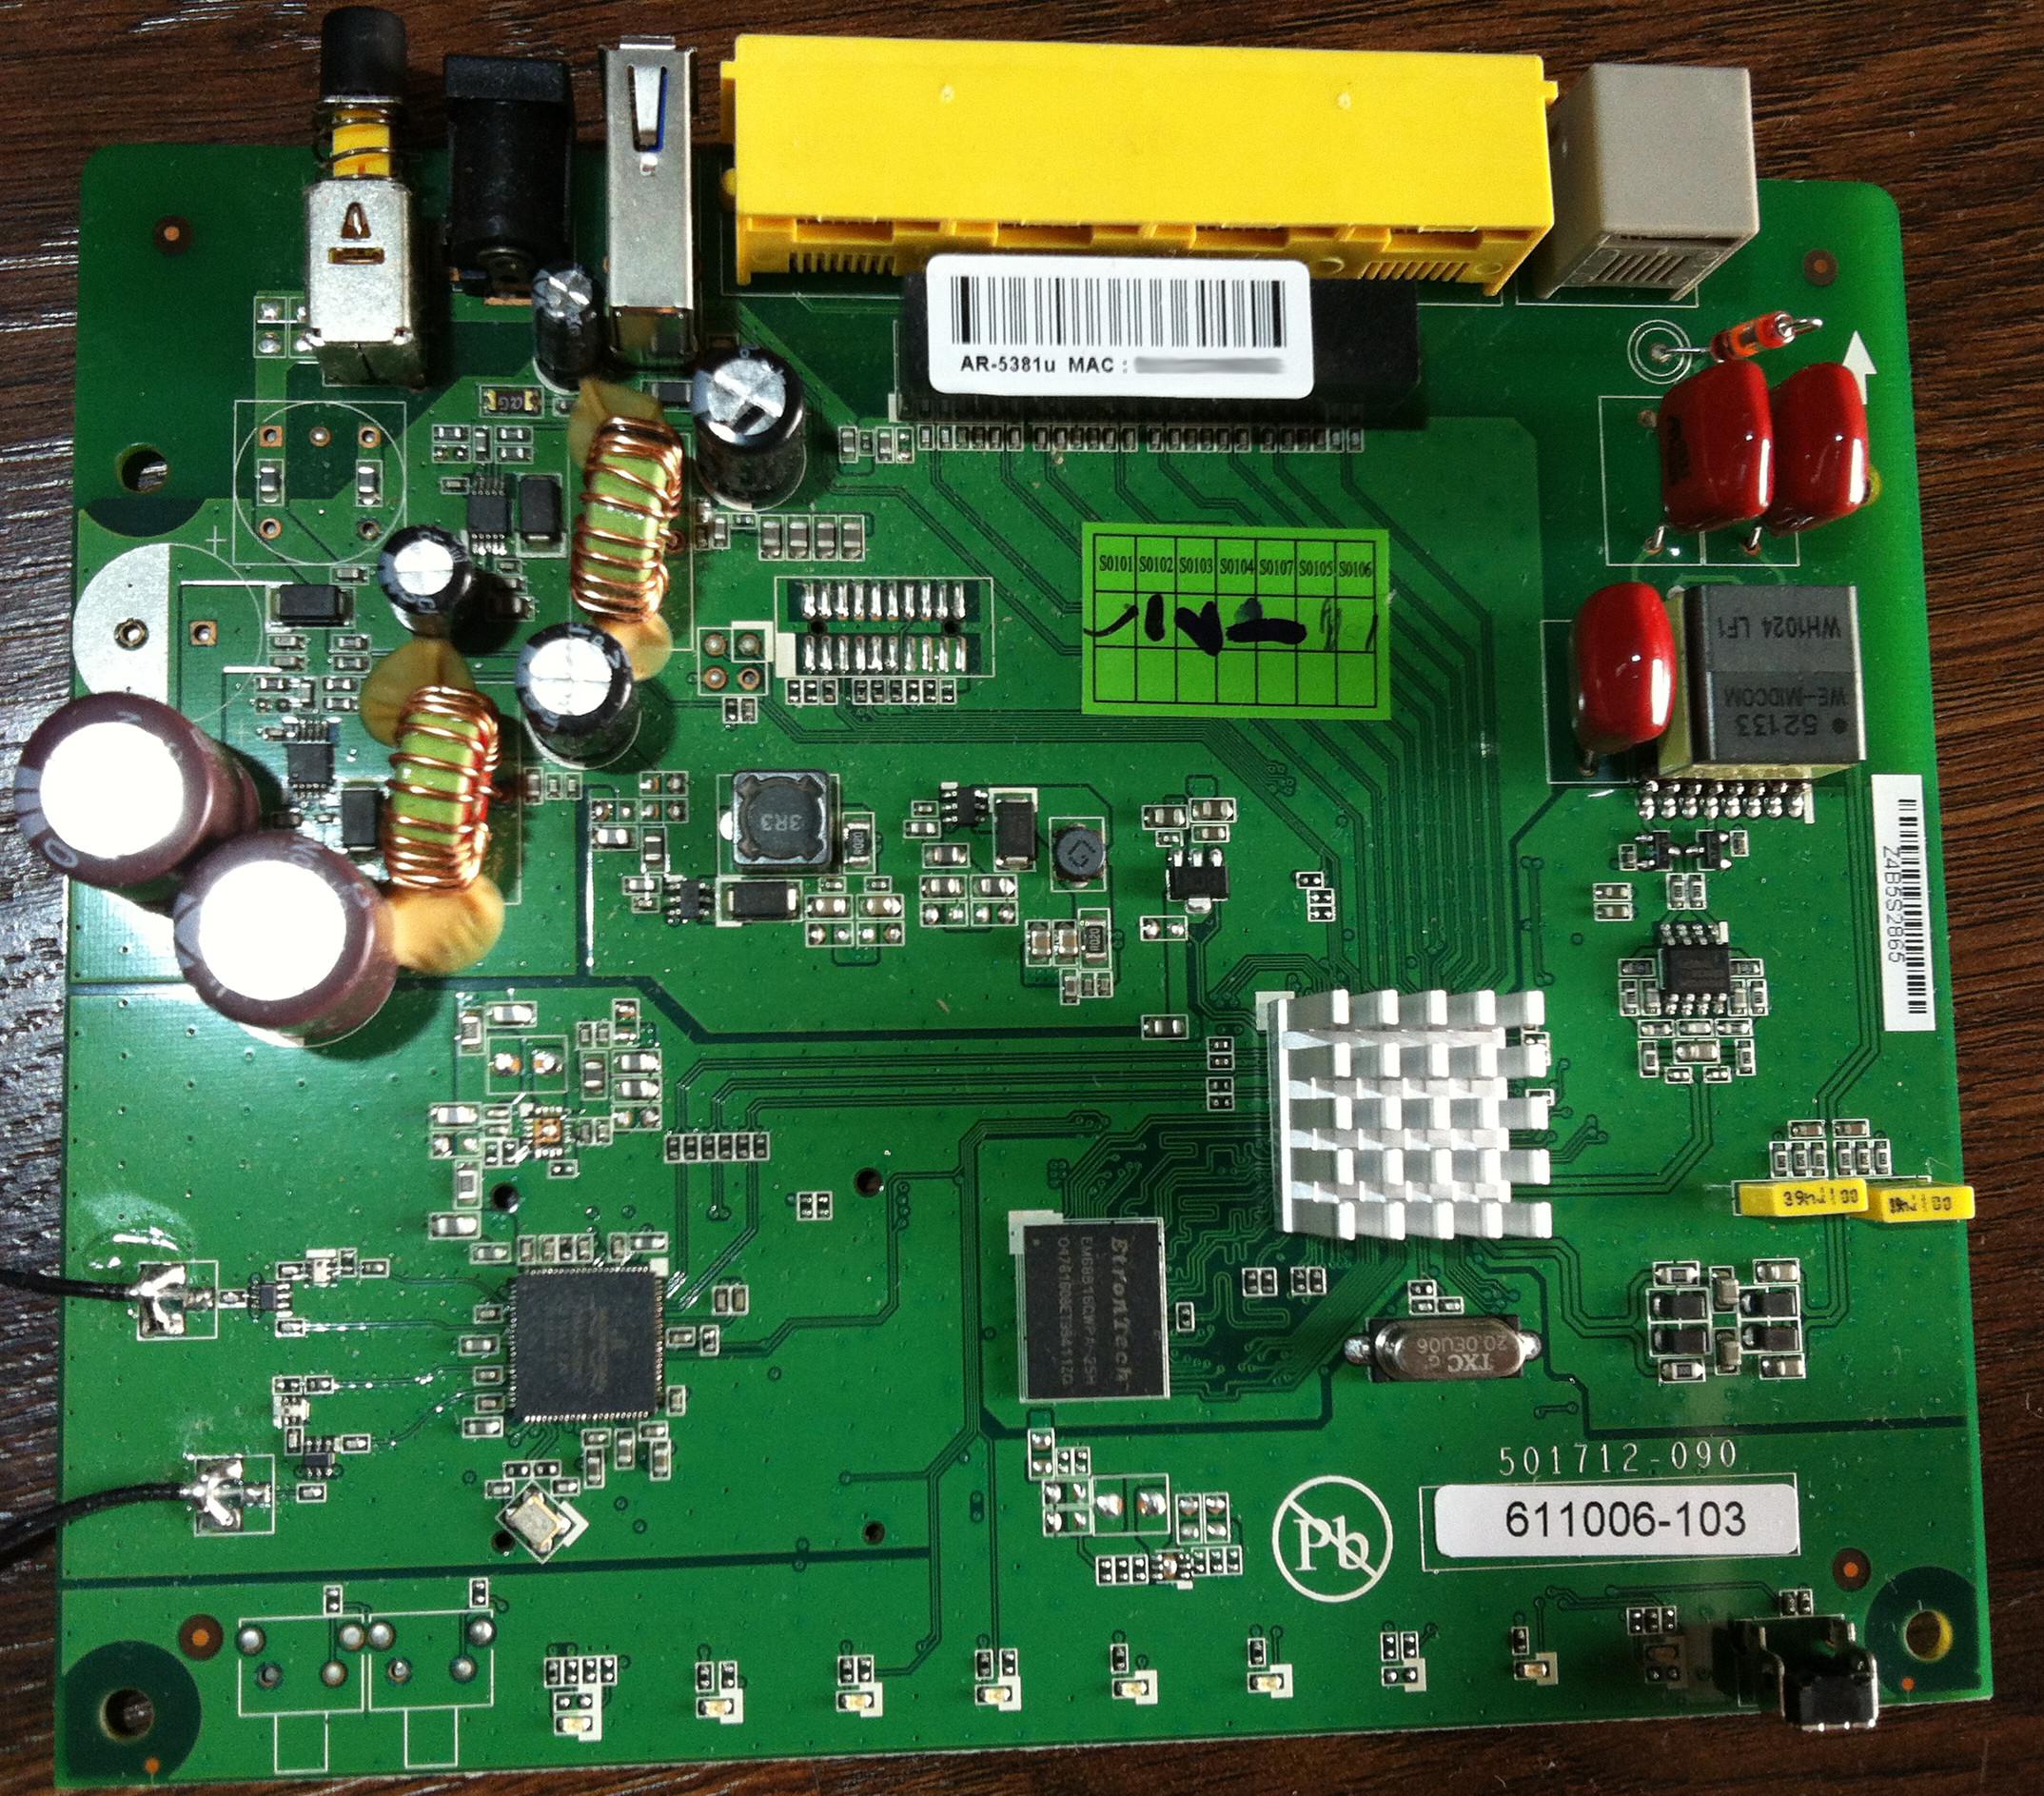 0X1002 0X5A61 PCI TREIBER WINDOWS XP